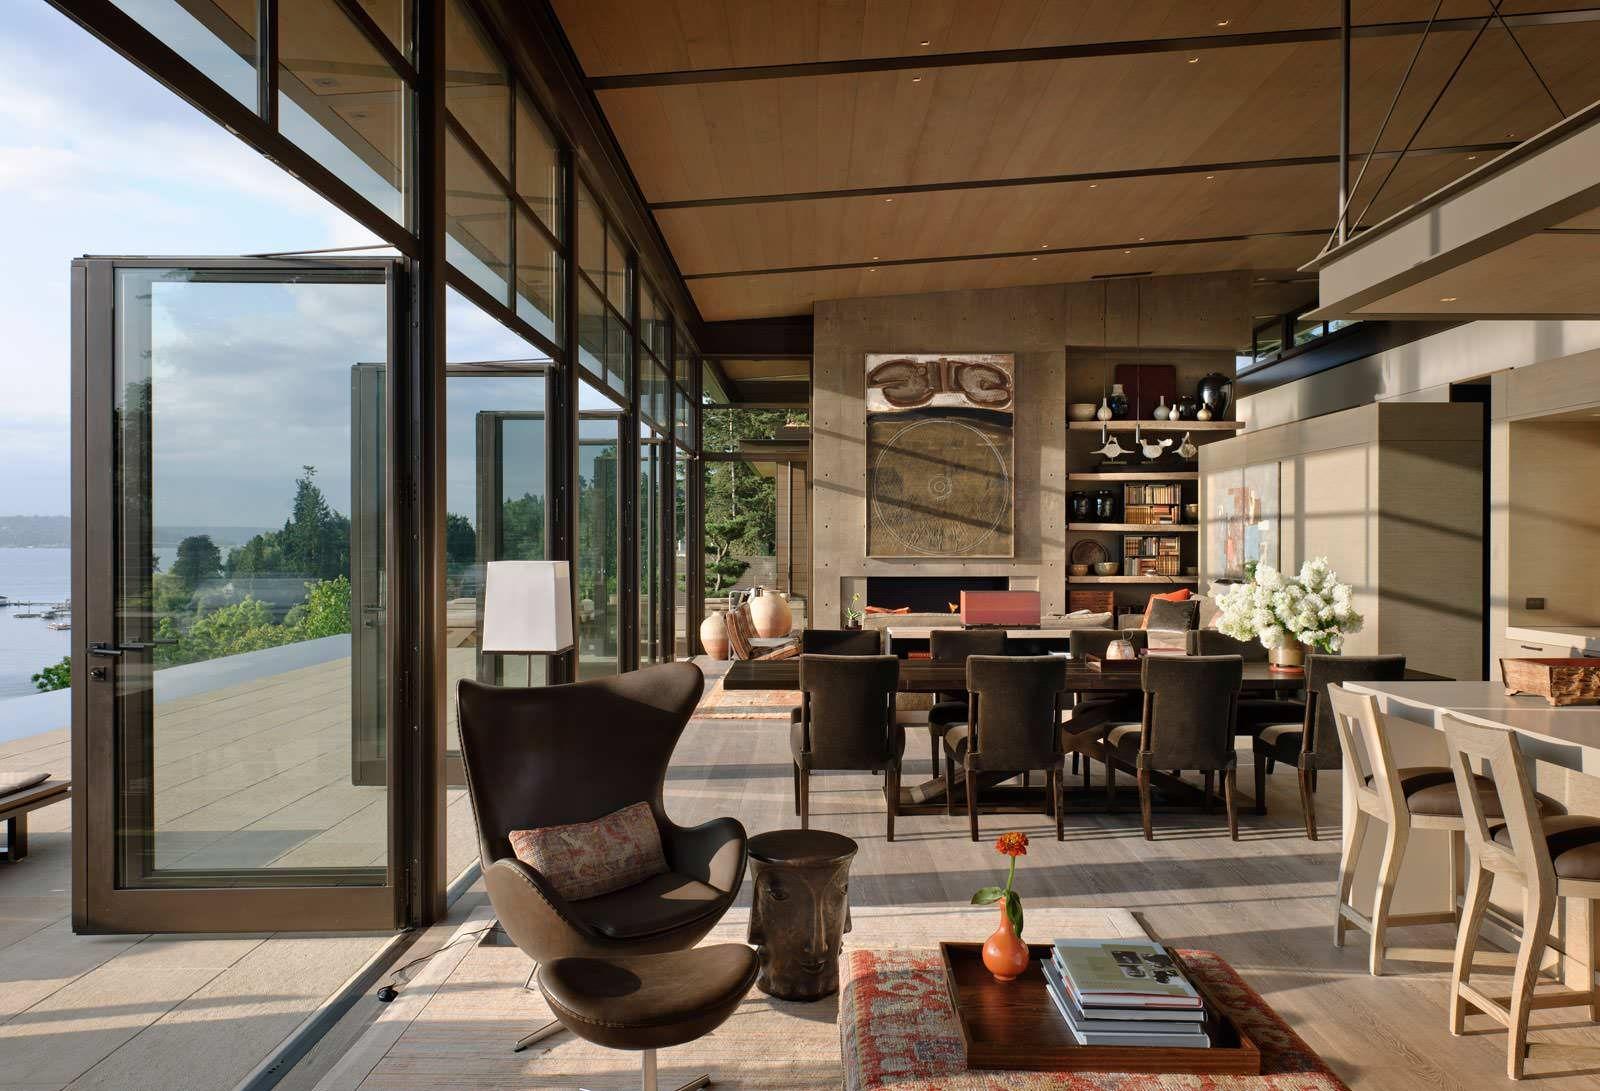 Doug Rasar Interior Design LLC | Seattle: Washington Park Dining chairs